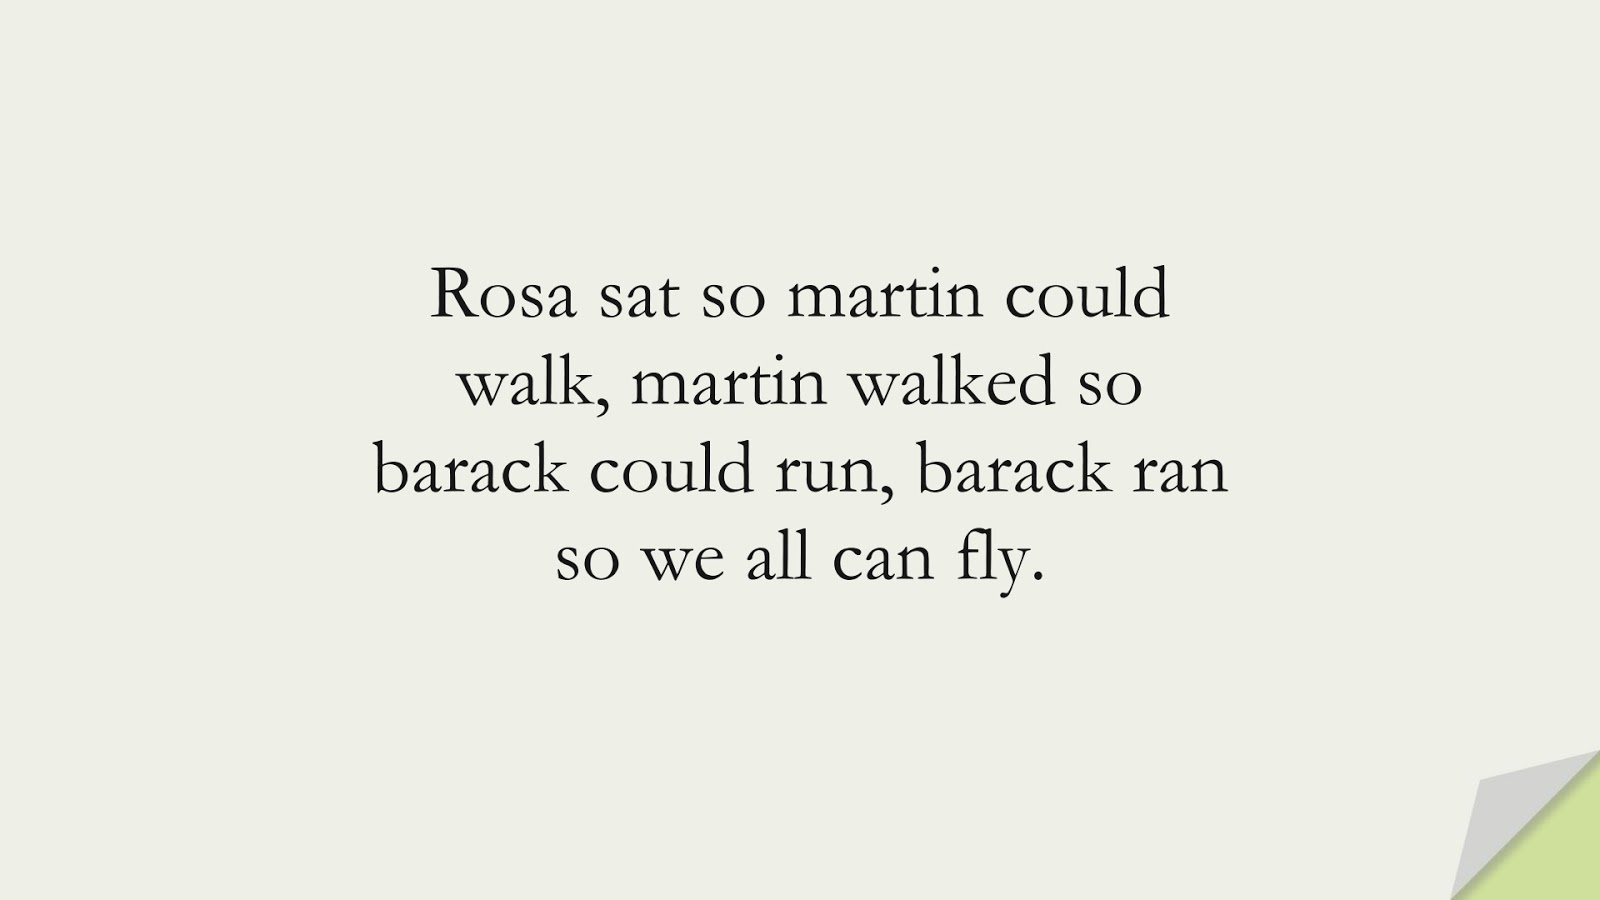 Rosa sat so martin could walk, martin walked so barack could run, barack ran so we all can fly.FALSE